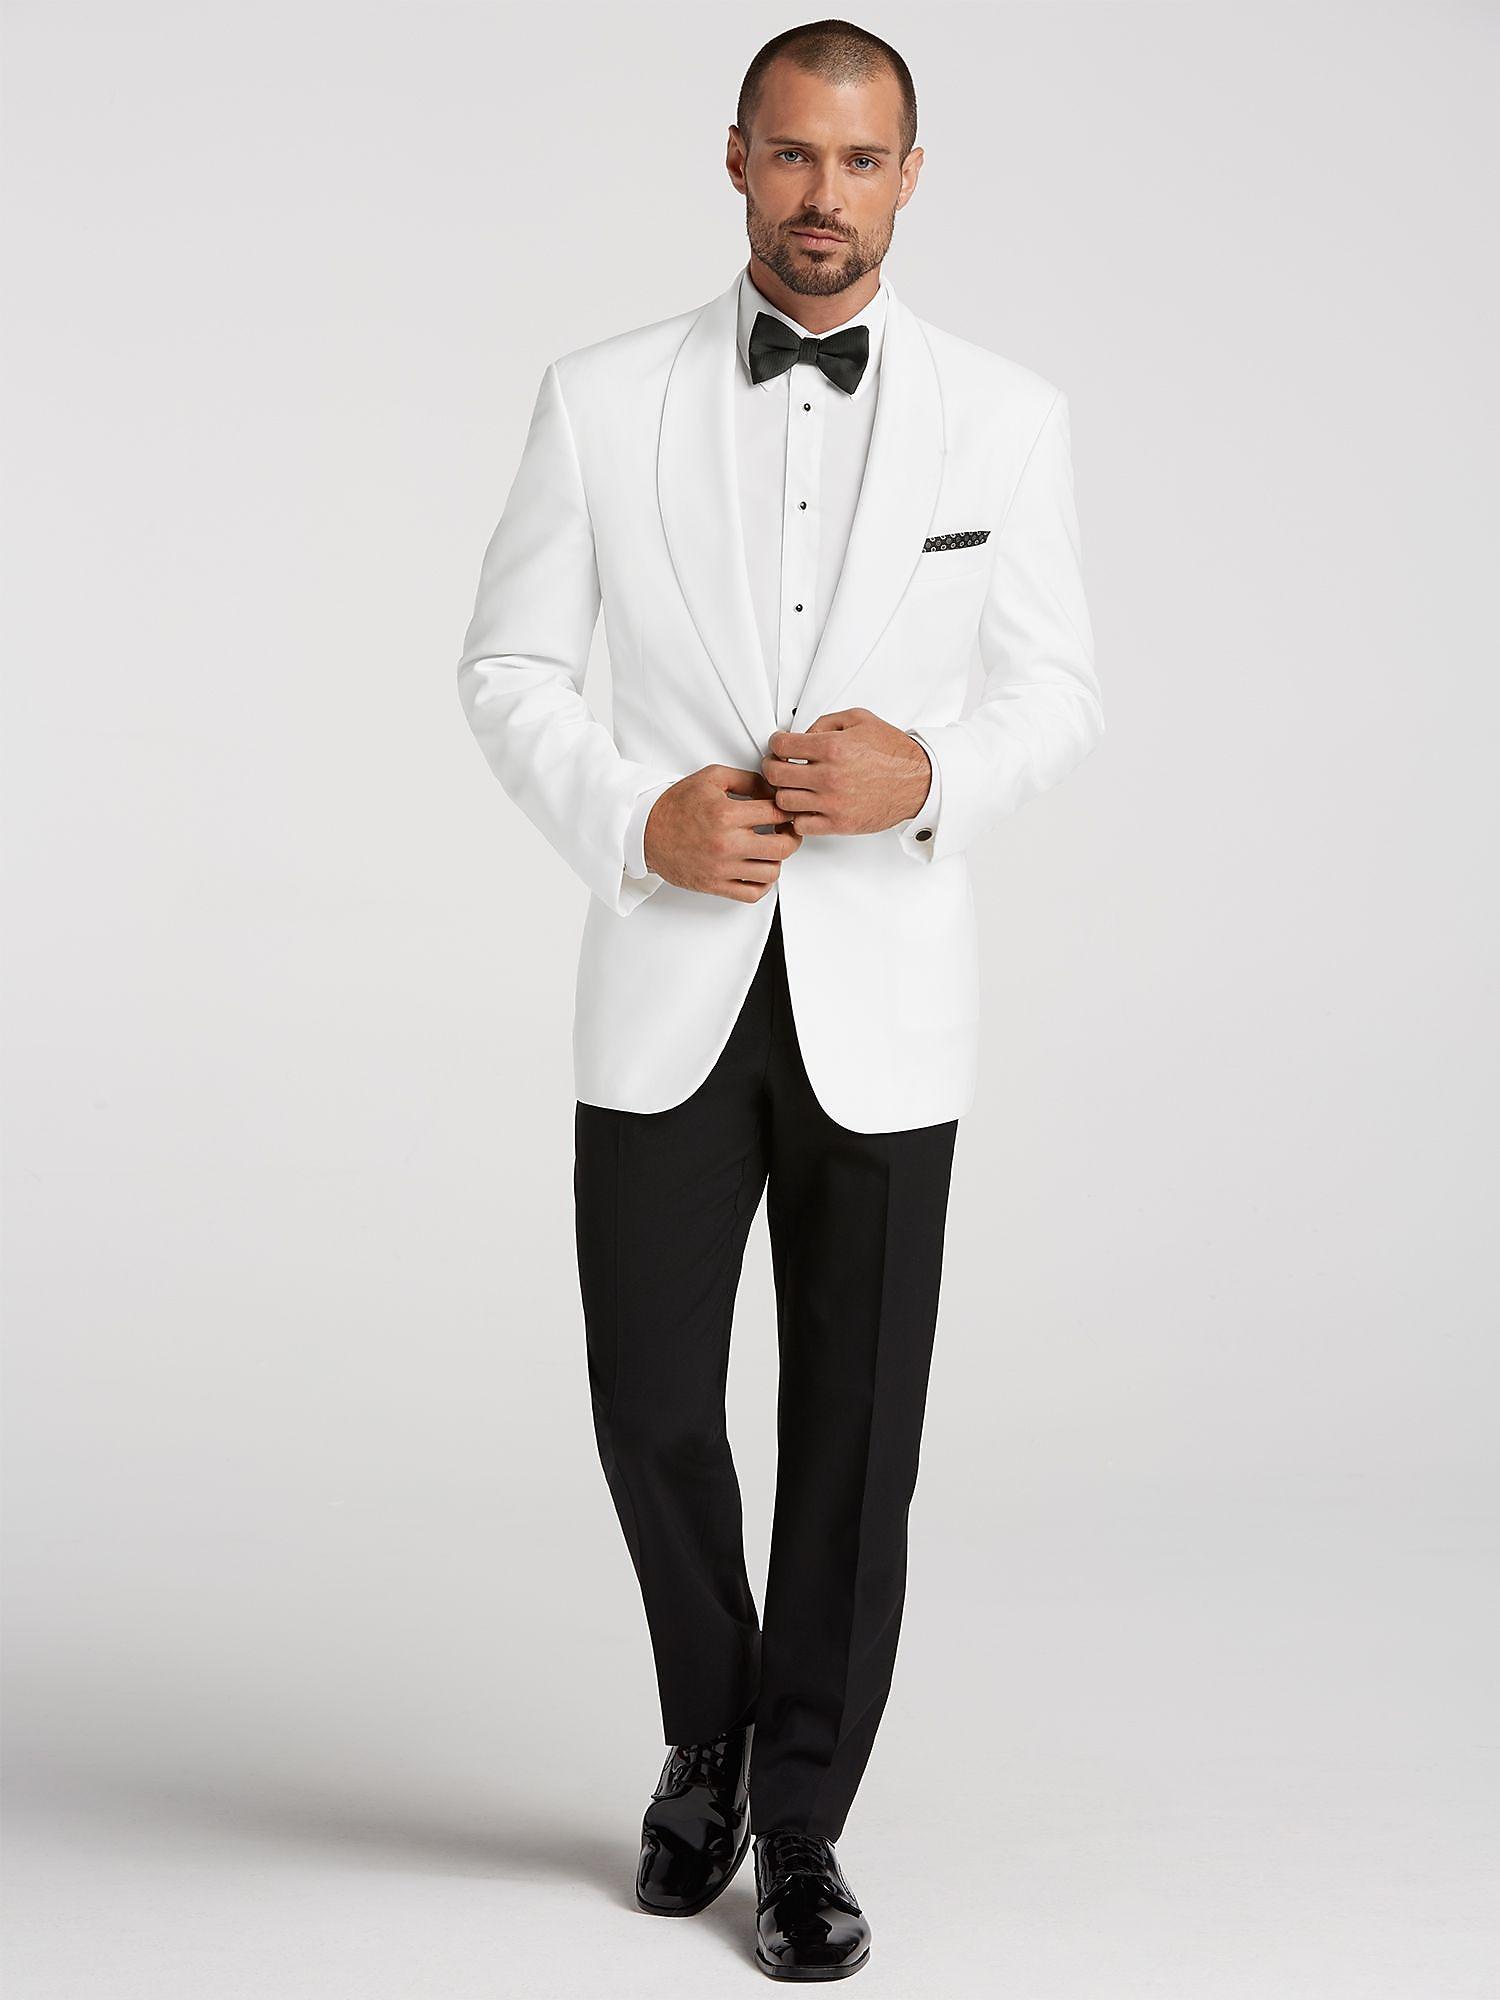 500d3b6fefb1 White Tuxedo Jacket   StudioSuits  Made To Measure Custom Suits .